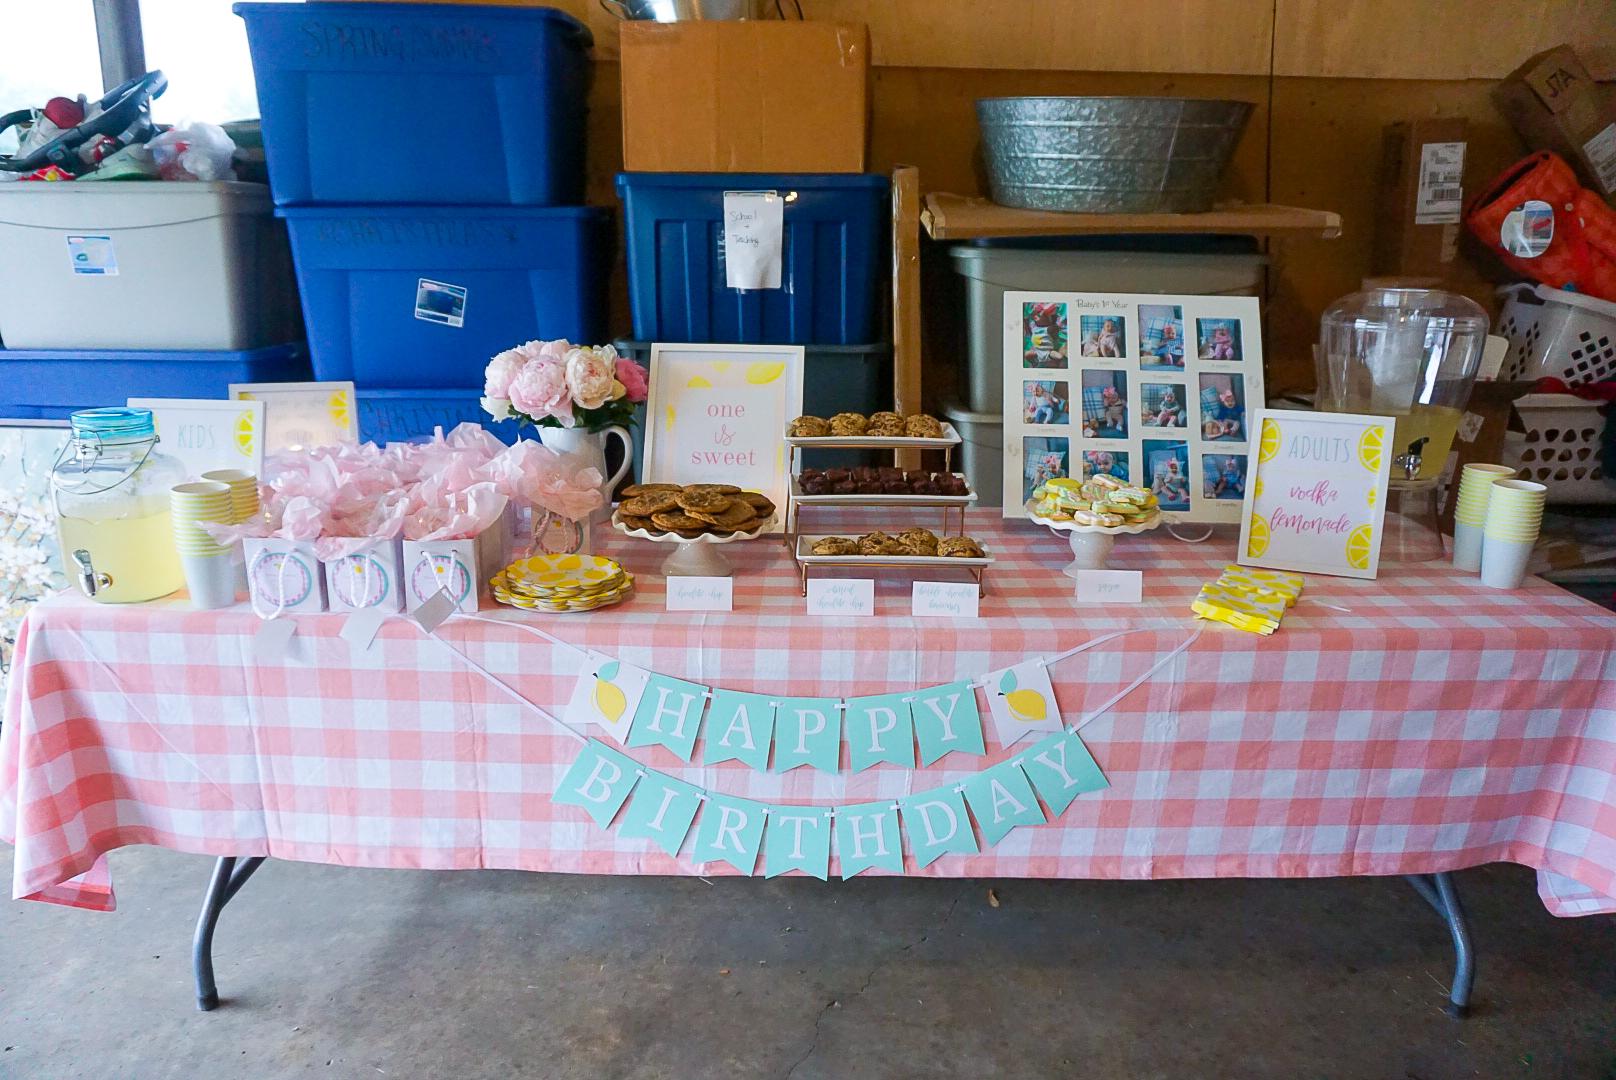 garage birthday party, gingham birthday party, COVID birthday 2020, baby girl's first birthday